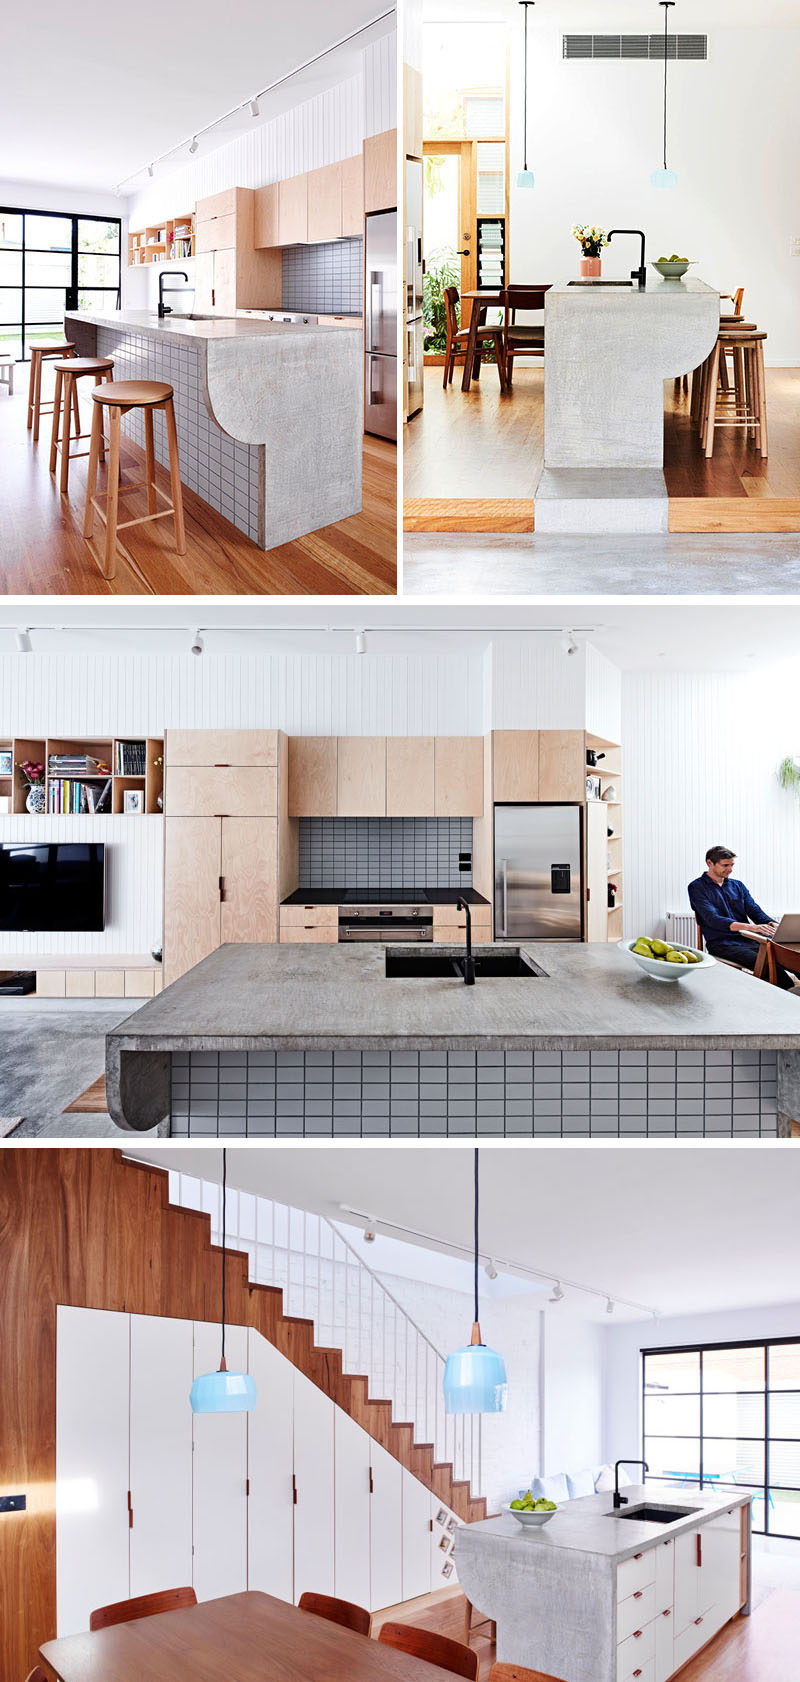 11 Creative Concrete Countertop Designs To Inspire You | CONTEMPORIST